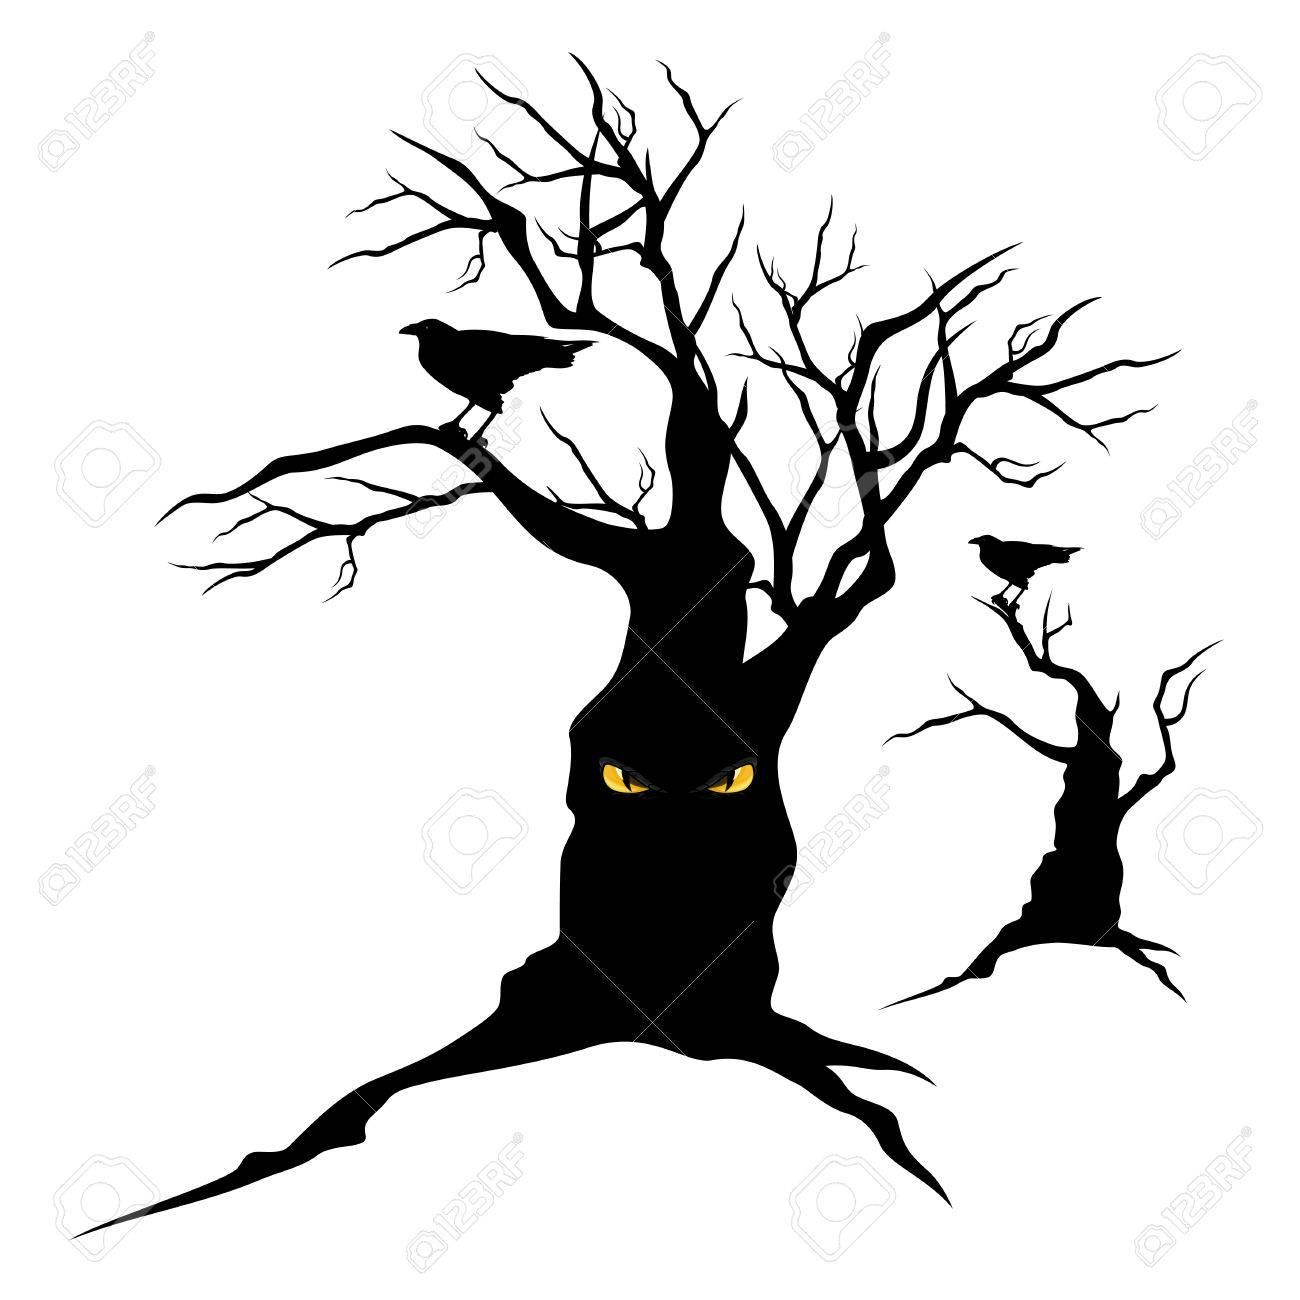 1300x1300 Black Raven Sitting On Creepy Halloween Tree With Evil Eyes